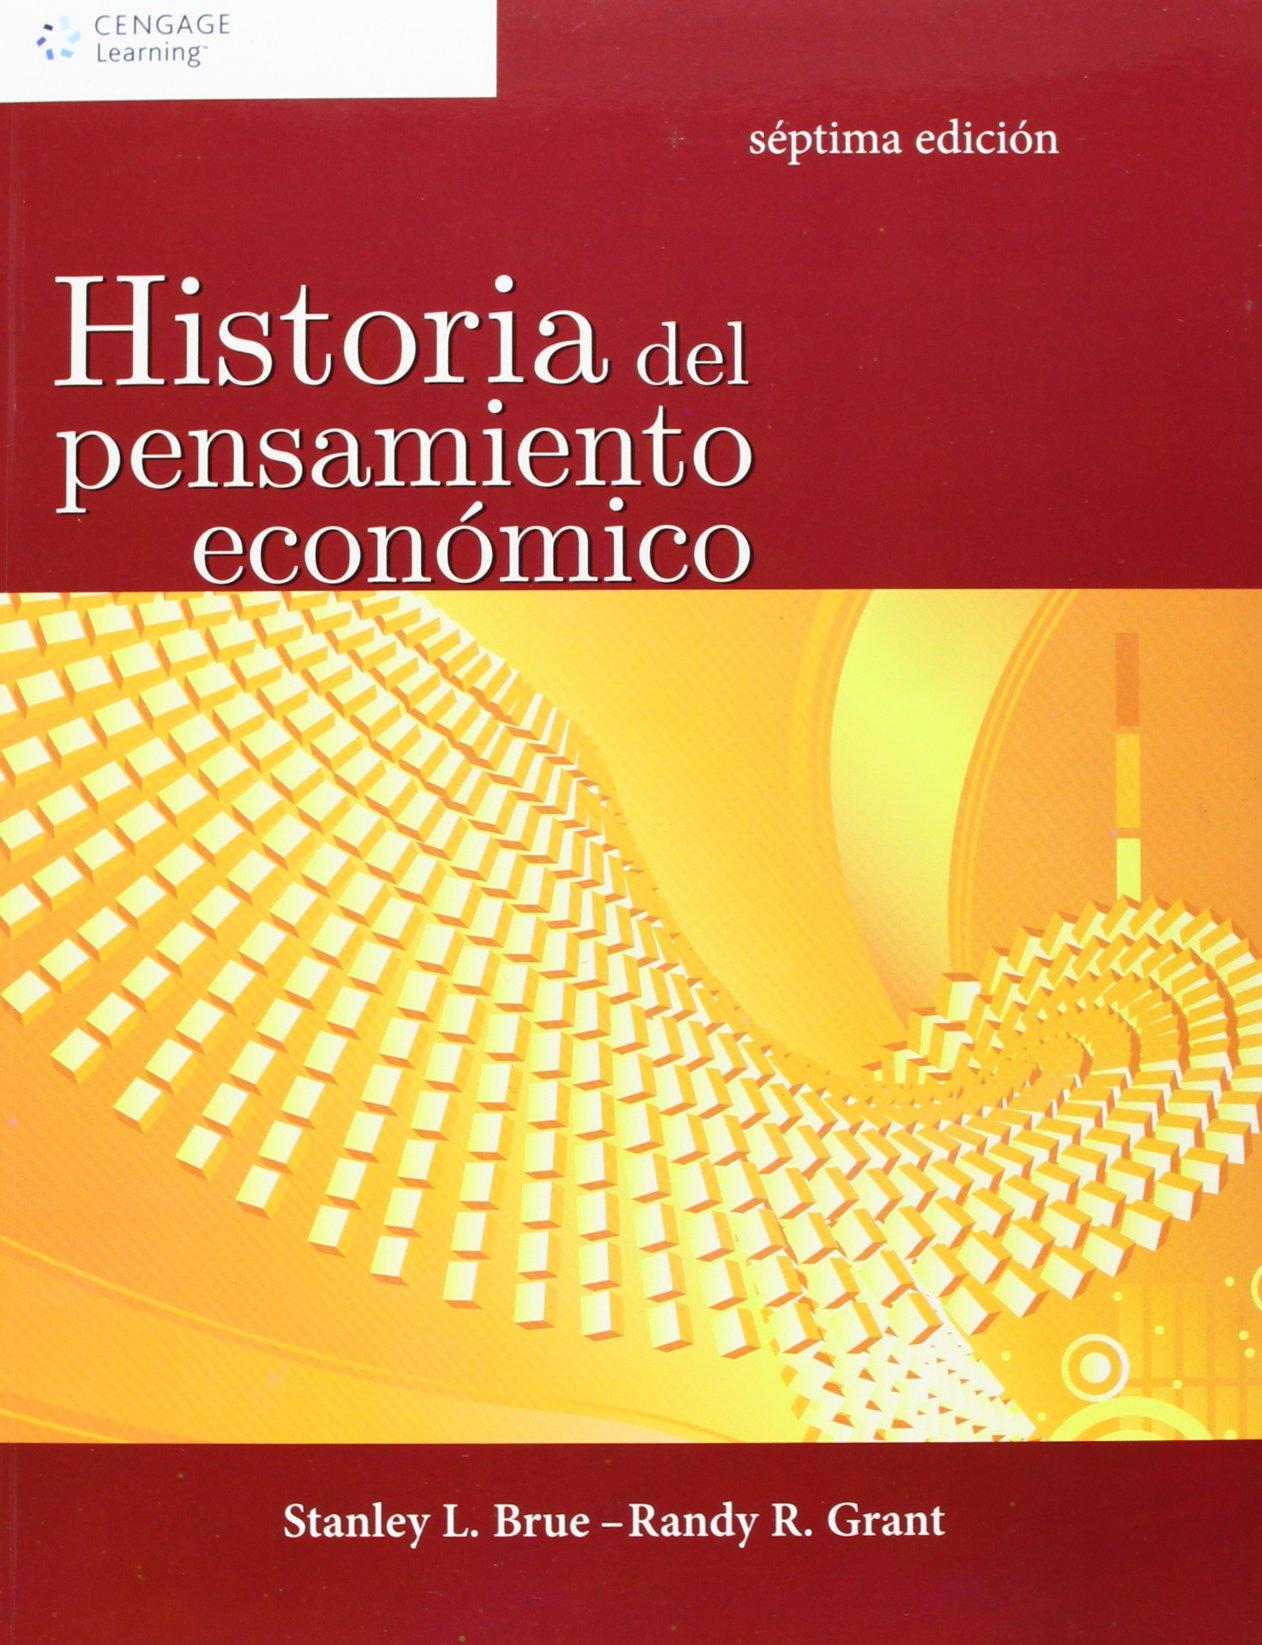 Historia del pensamiento economico  The Evolution of Economic Thought  (Spanish Edition) (Spanish) Paperback – May 15 0711a402bb4